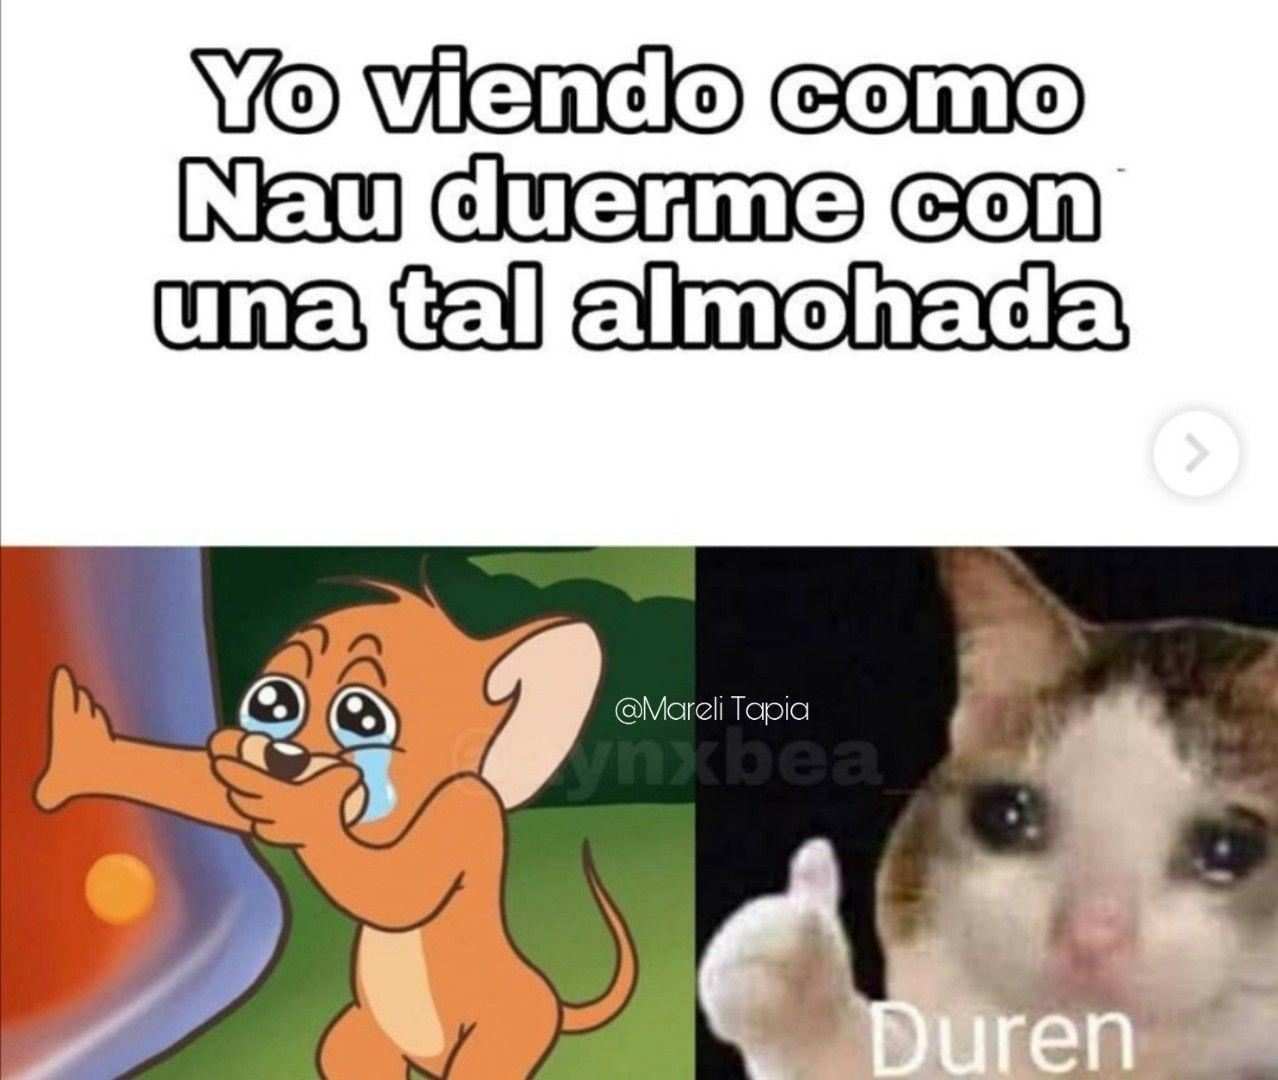 Nau Meme Memes Adexe Y Nau Fotos Adexe Y Nau Imagenes